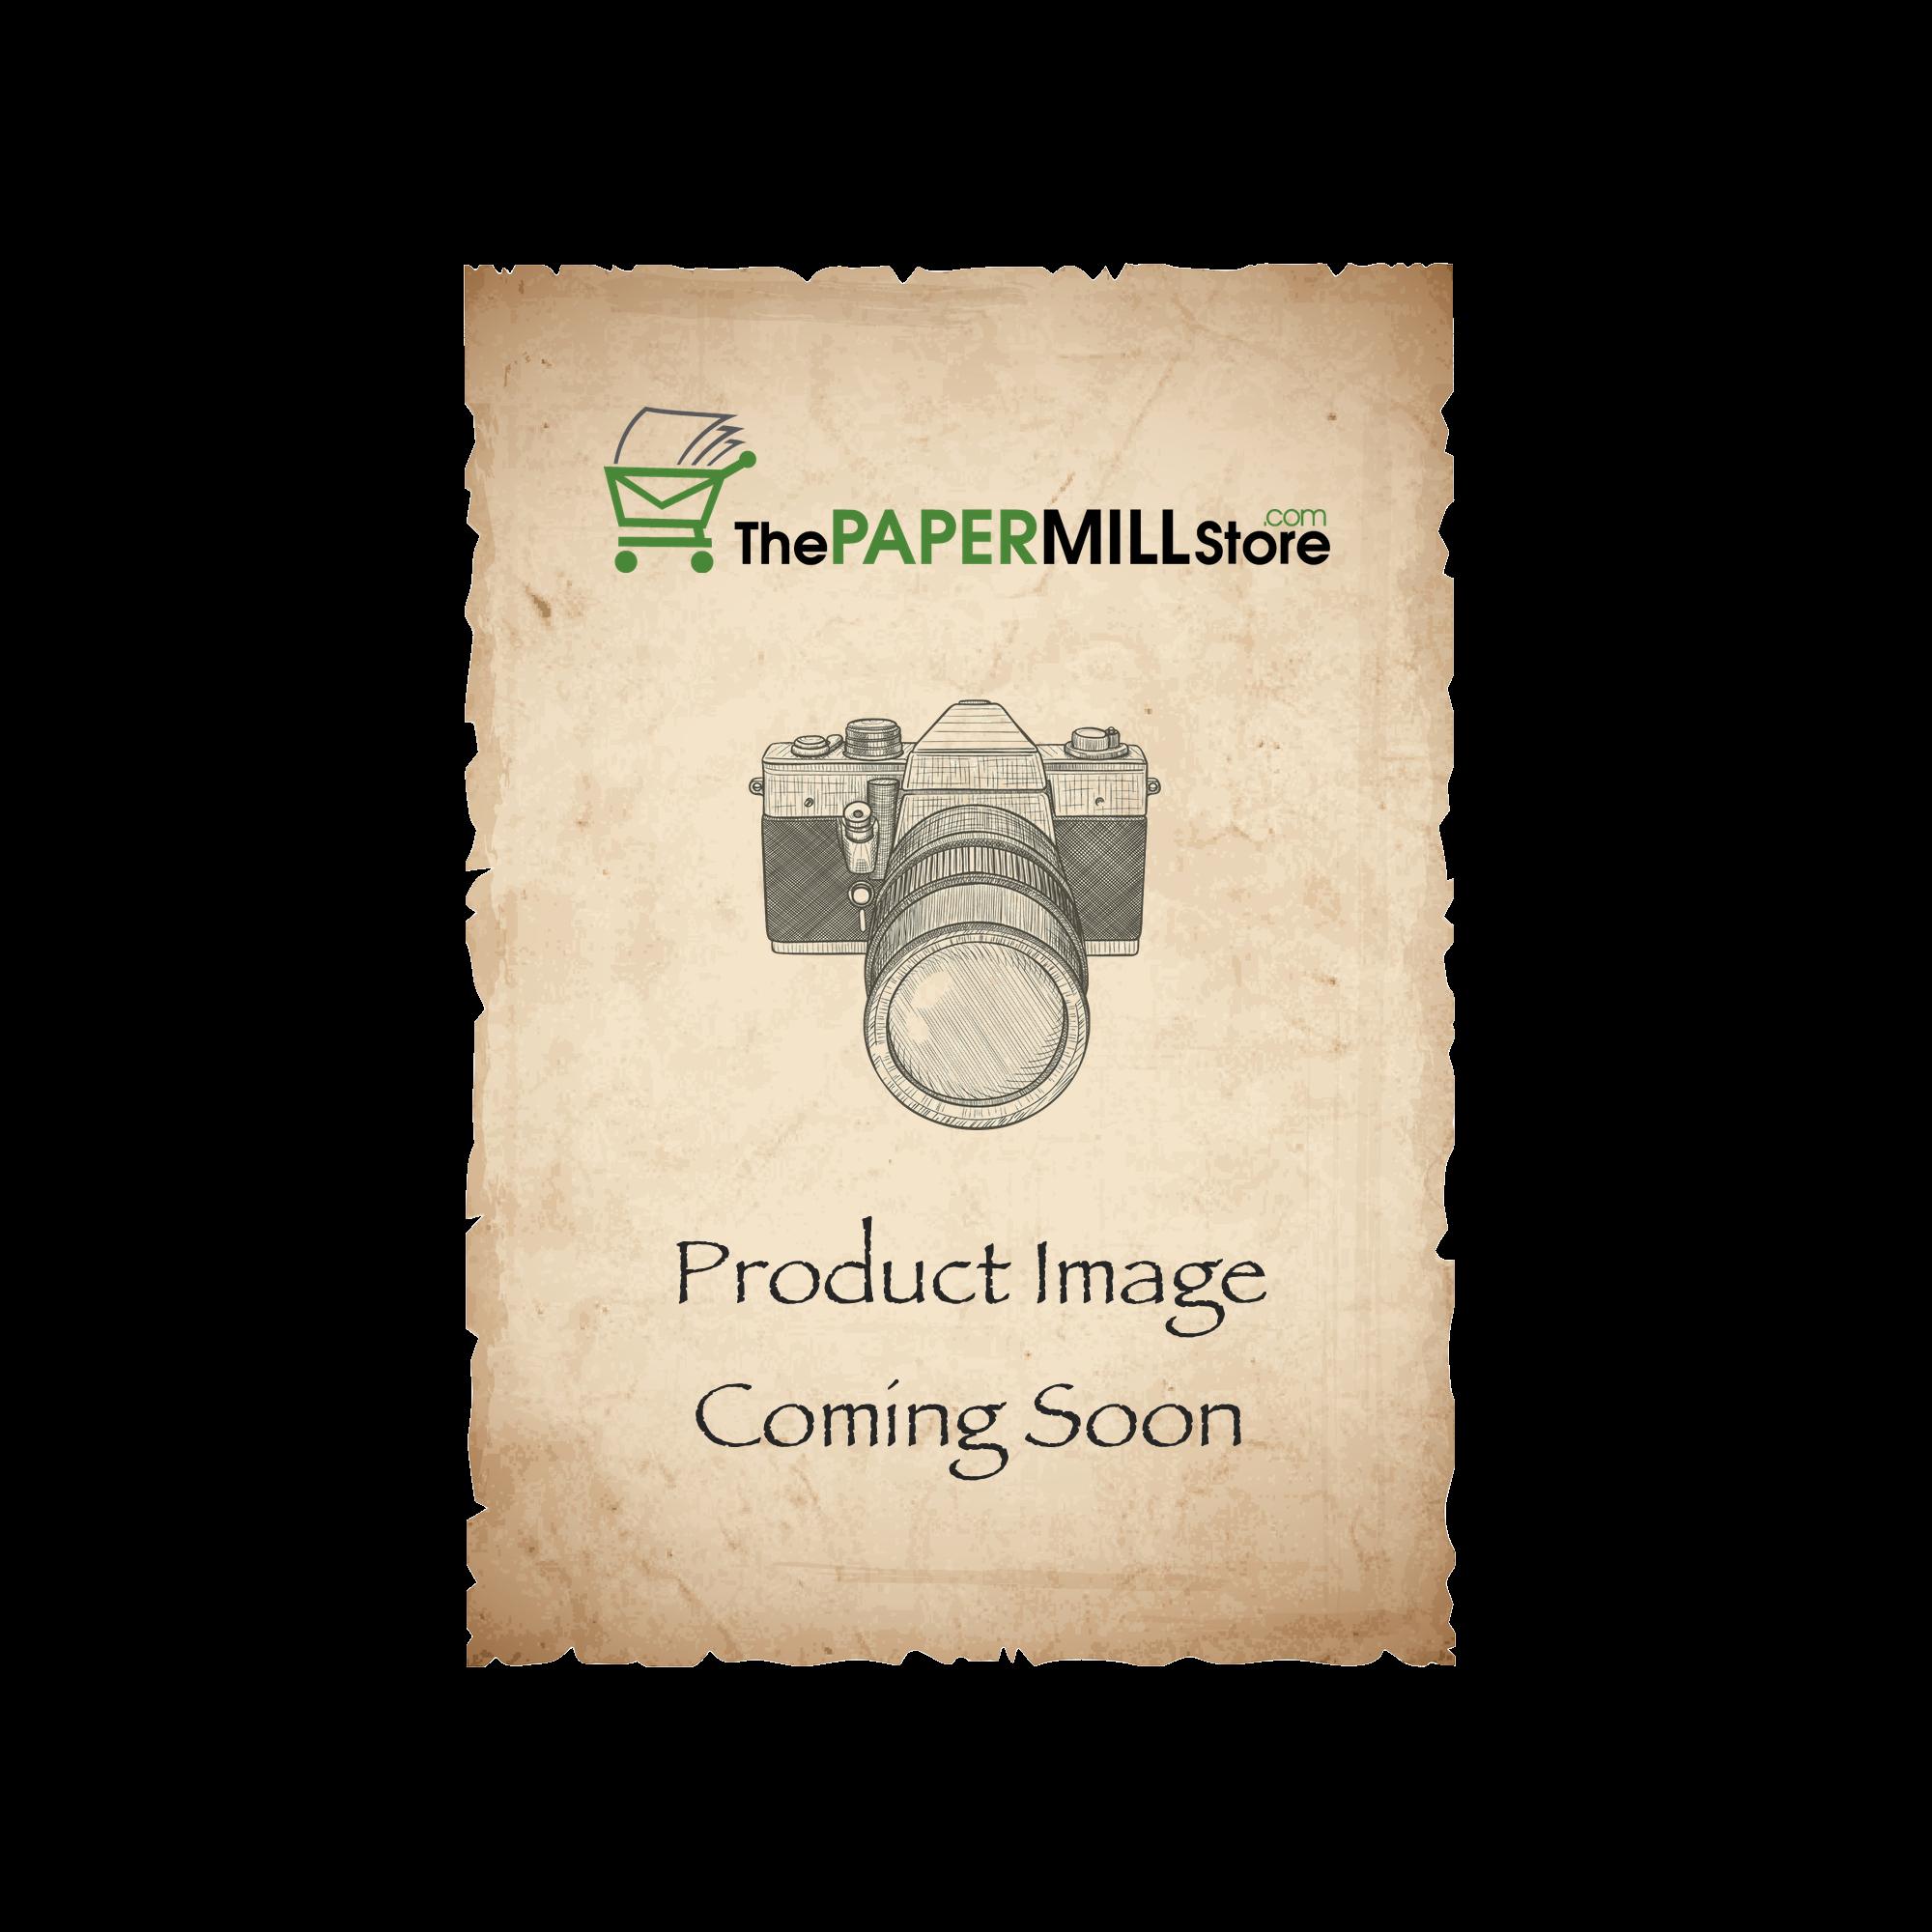 CLASSIC CREST Classic Cream Envelopes - Lee (5 1/4 x 7 1/4) 70 lb Text Smooth 2500 per Carton